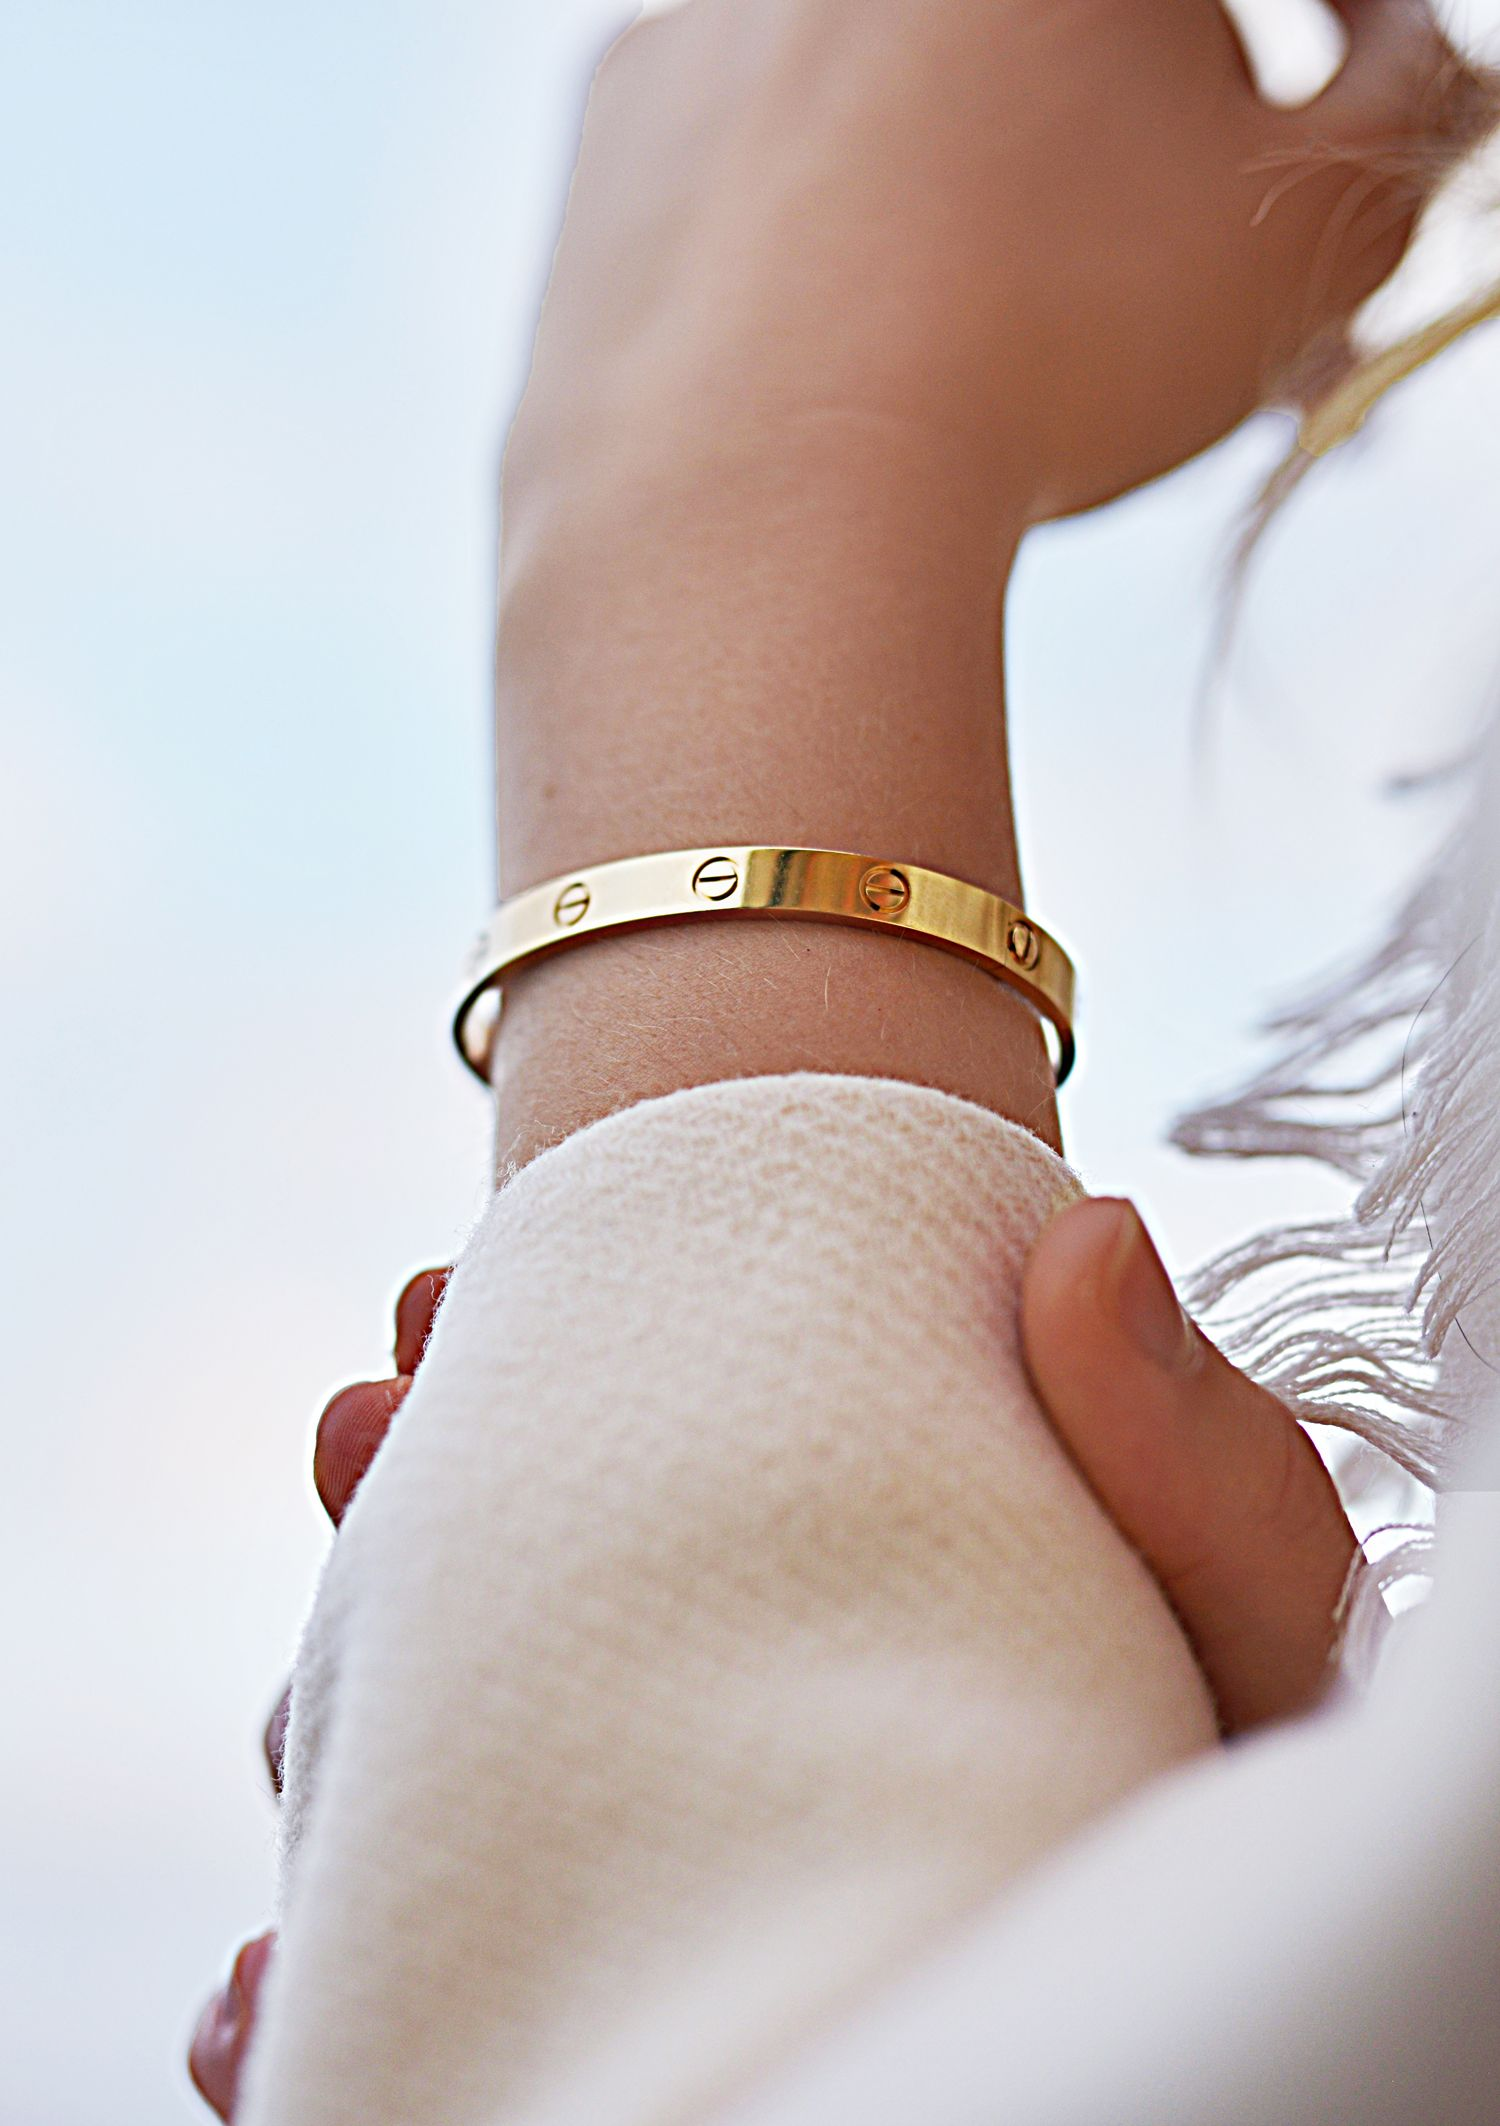 Cartier love bracelet pinterest yarenak ium a simple girl